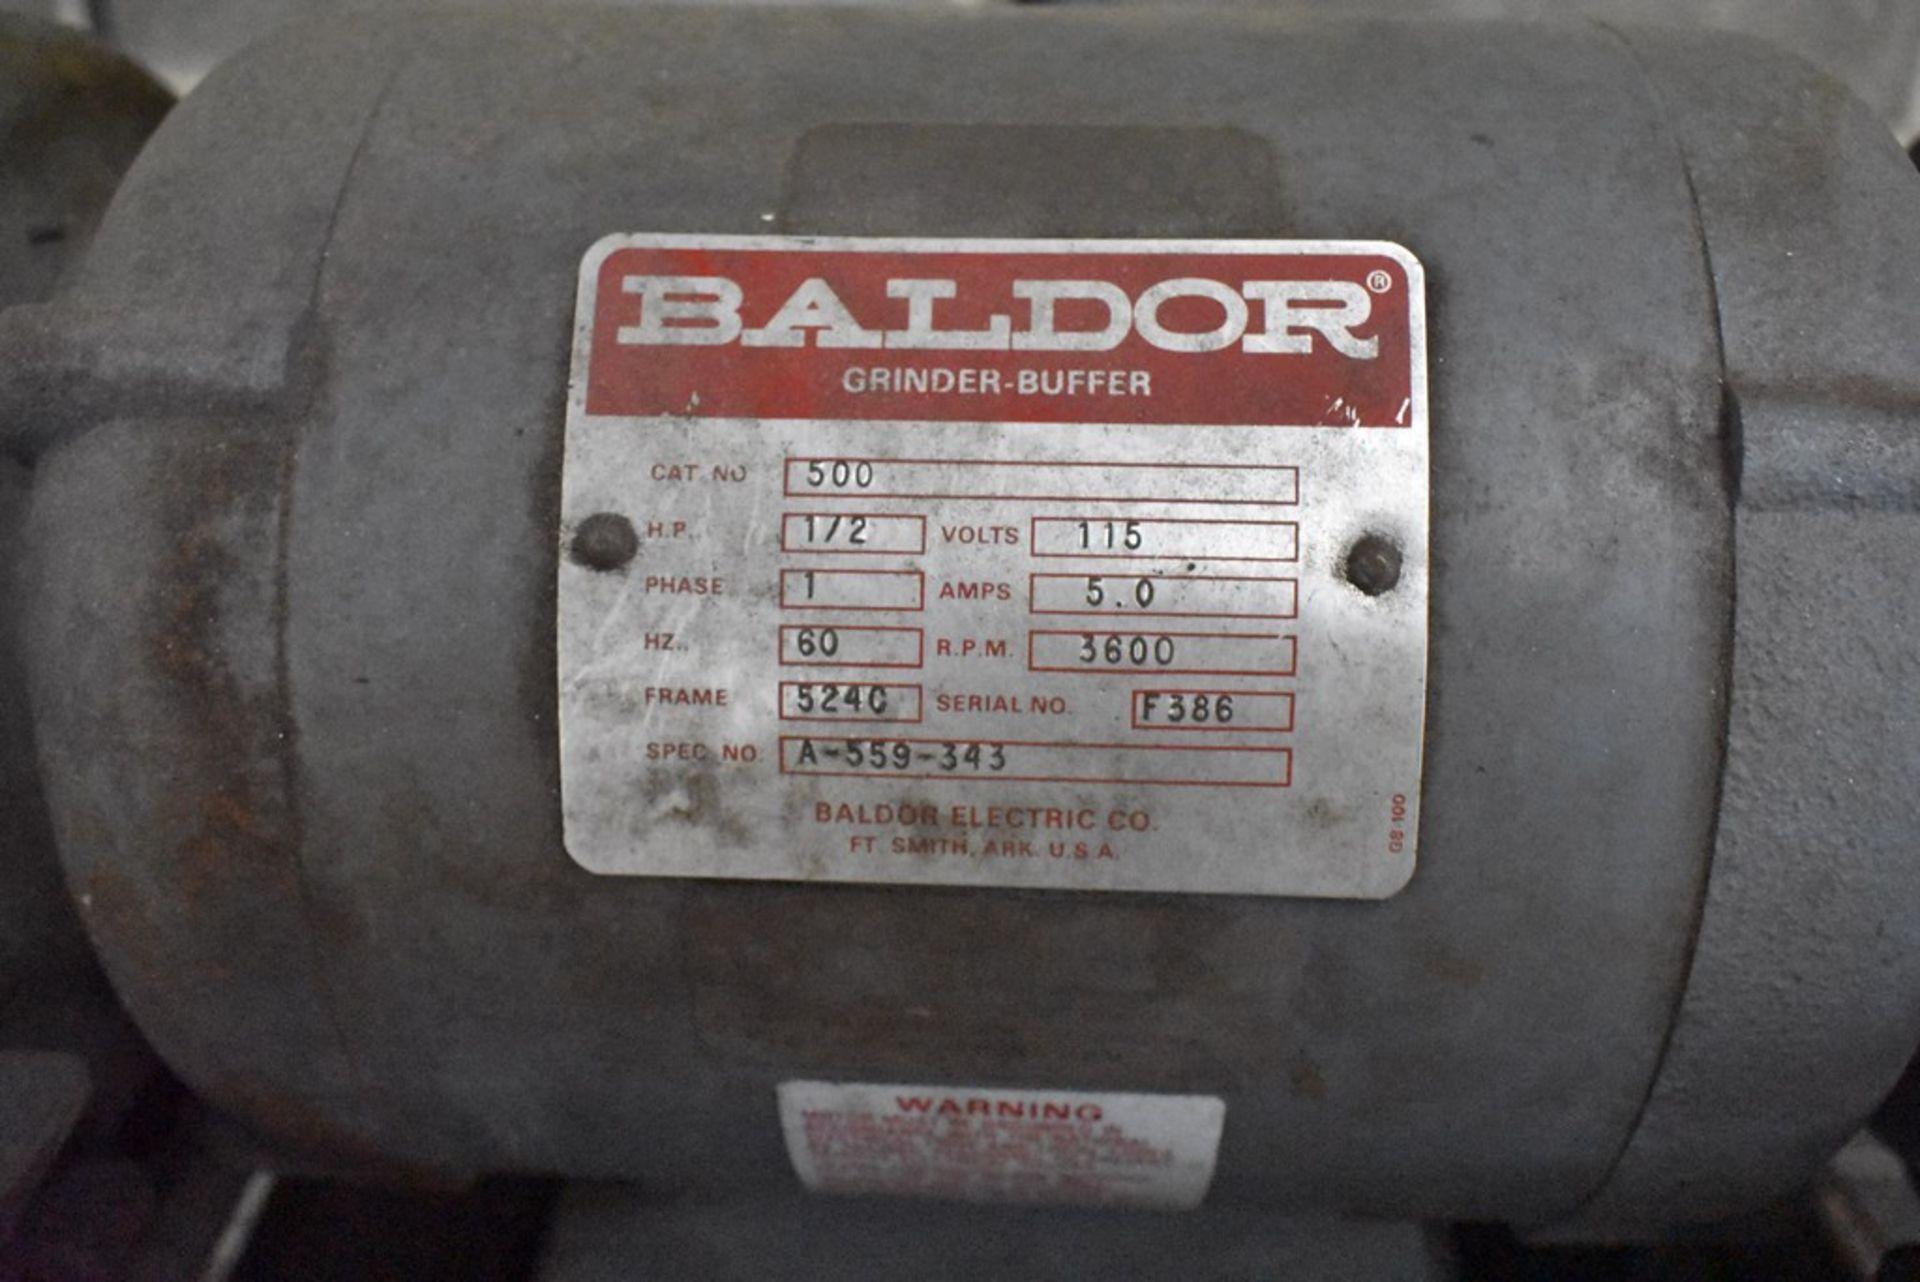 BALDOR ½ HP PEDESTAL DOUBLE END CARBIDE TOOL GRINDER, S/N A-559-343 - Image 7 of 7